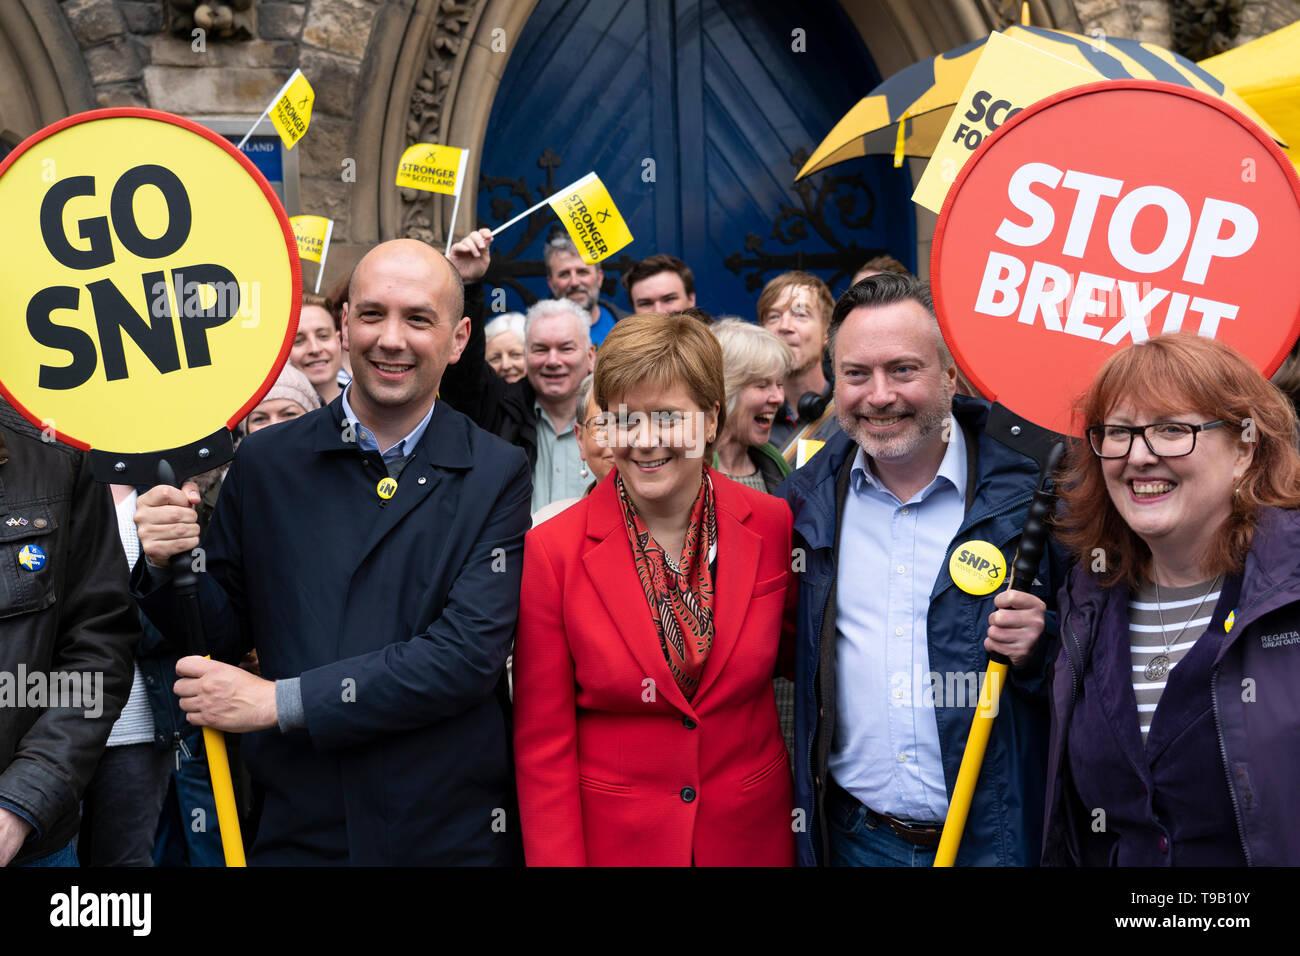 Edinburgh, Scotland, UK. 18 May 2019. Scotland's First Minister Nicola Sturgeon campaigns alongside lead SNP European candidate Alyn Smith on Leith Walk in Edinburgh. Credit: Iain Masterton/Alamy Live News - Stock Image